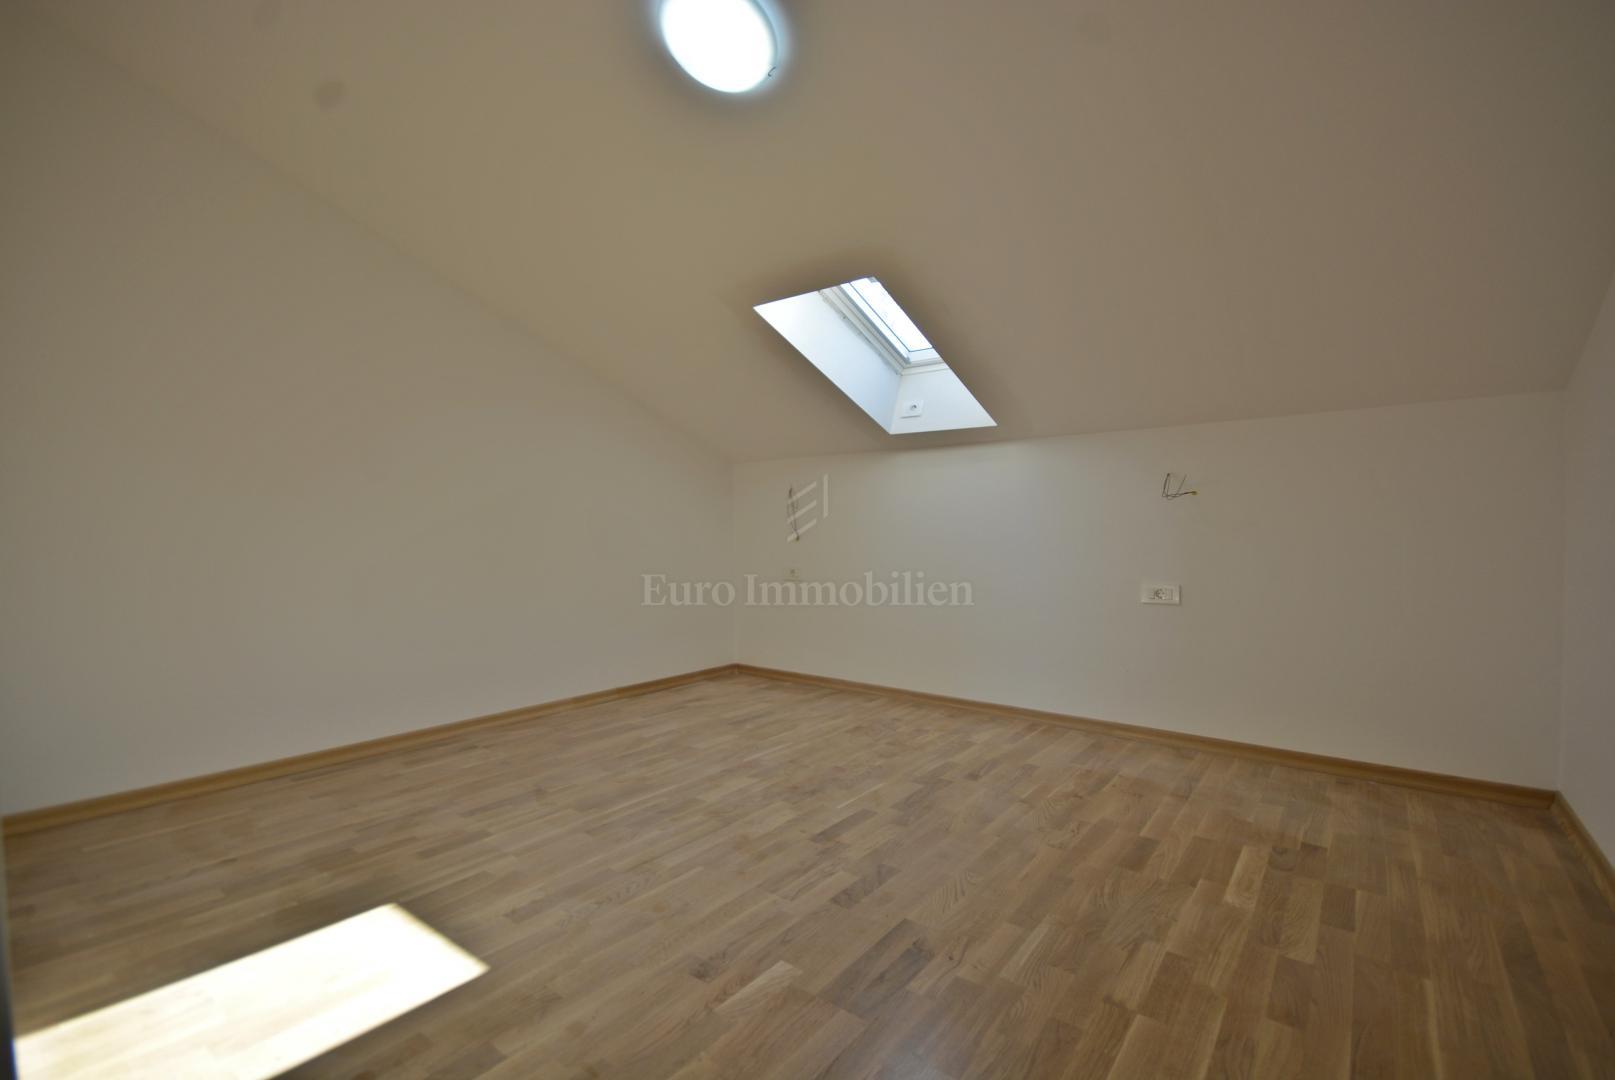 Komfortable Wohnung mit Meerblick